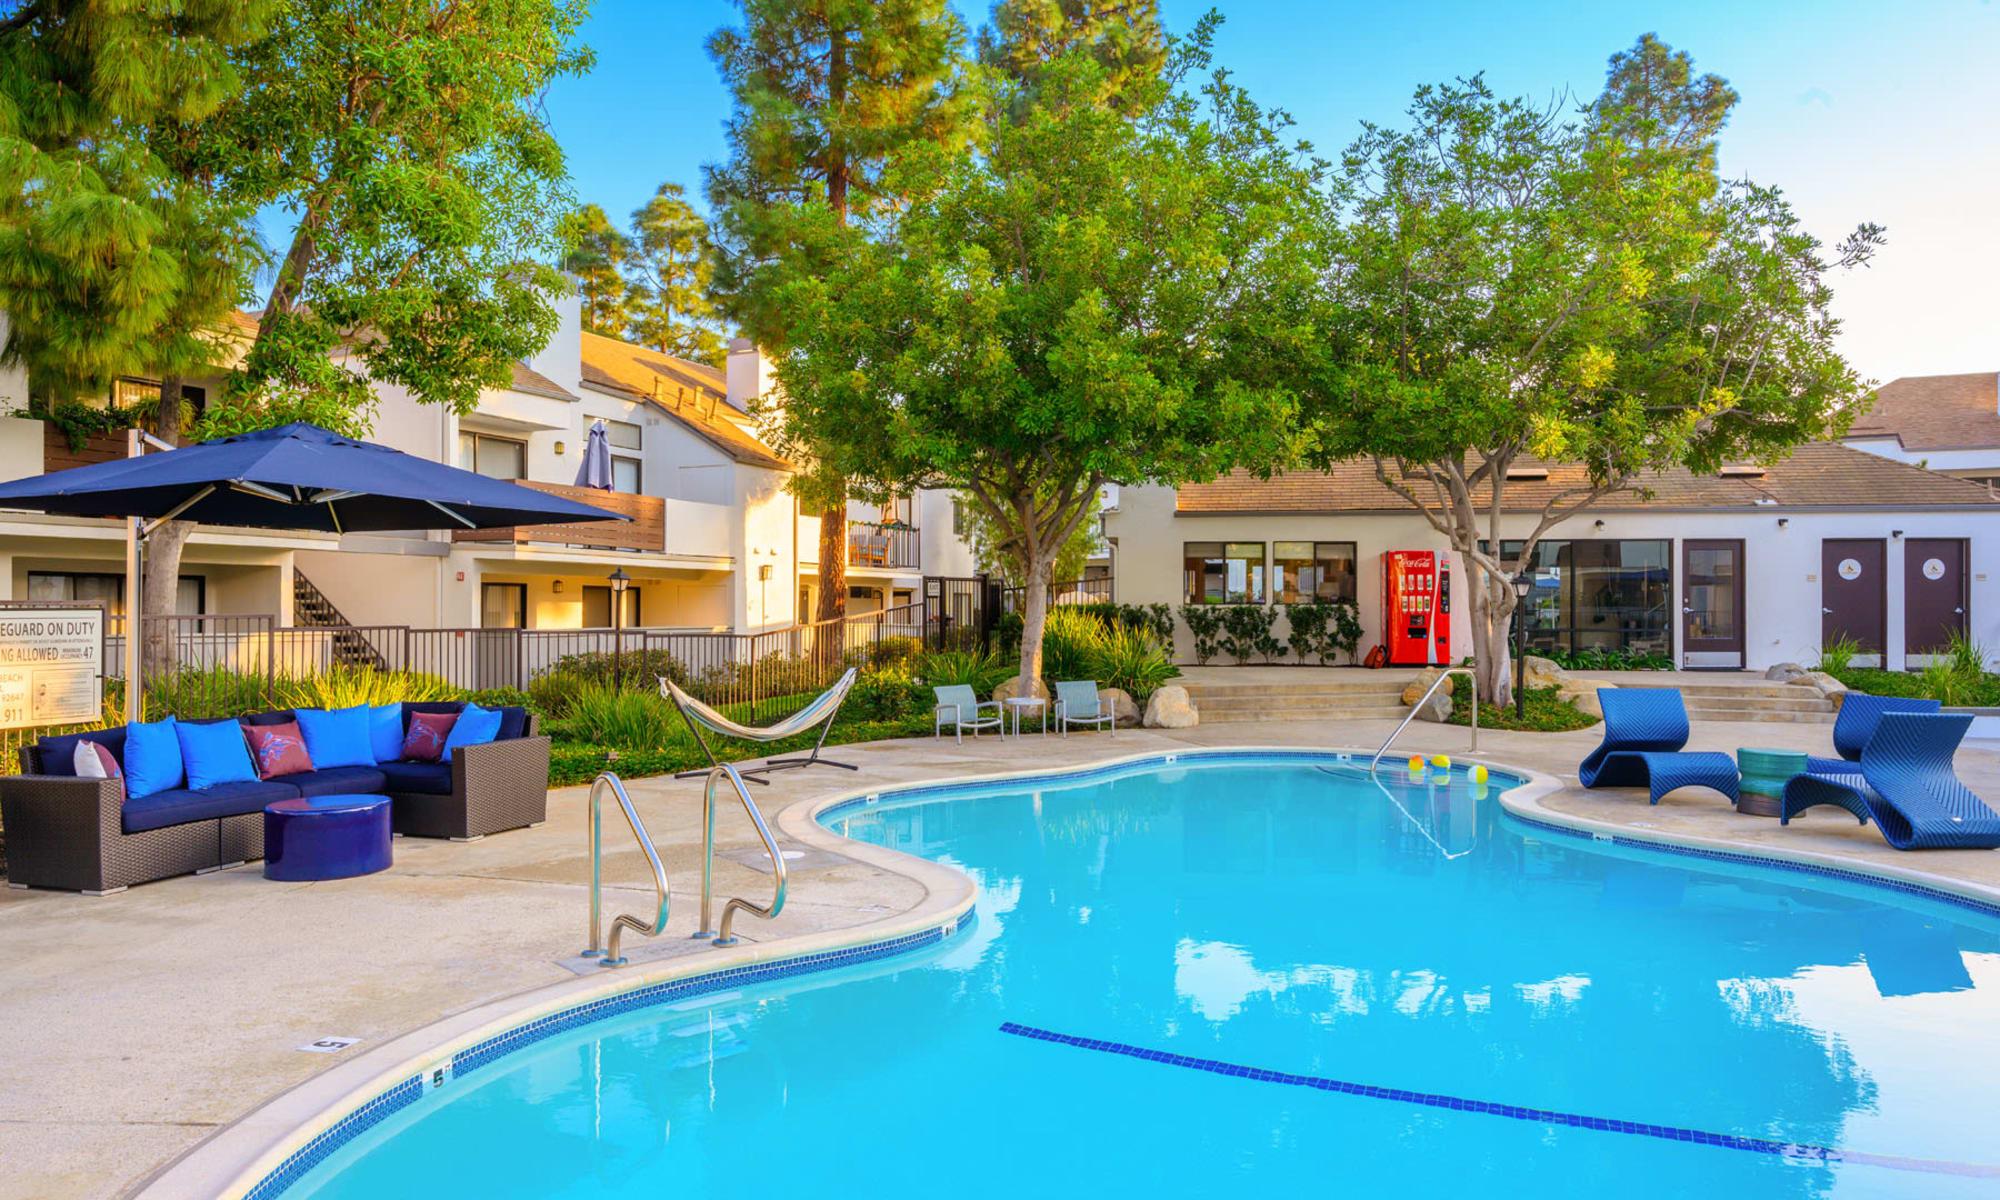 Shaded lounge areas near the swimming pool surrounded by mature trees at Sendero Huntington Beach in Huntington Beach, California